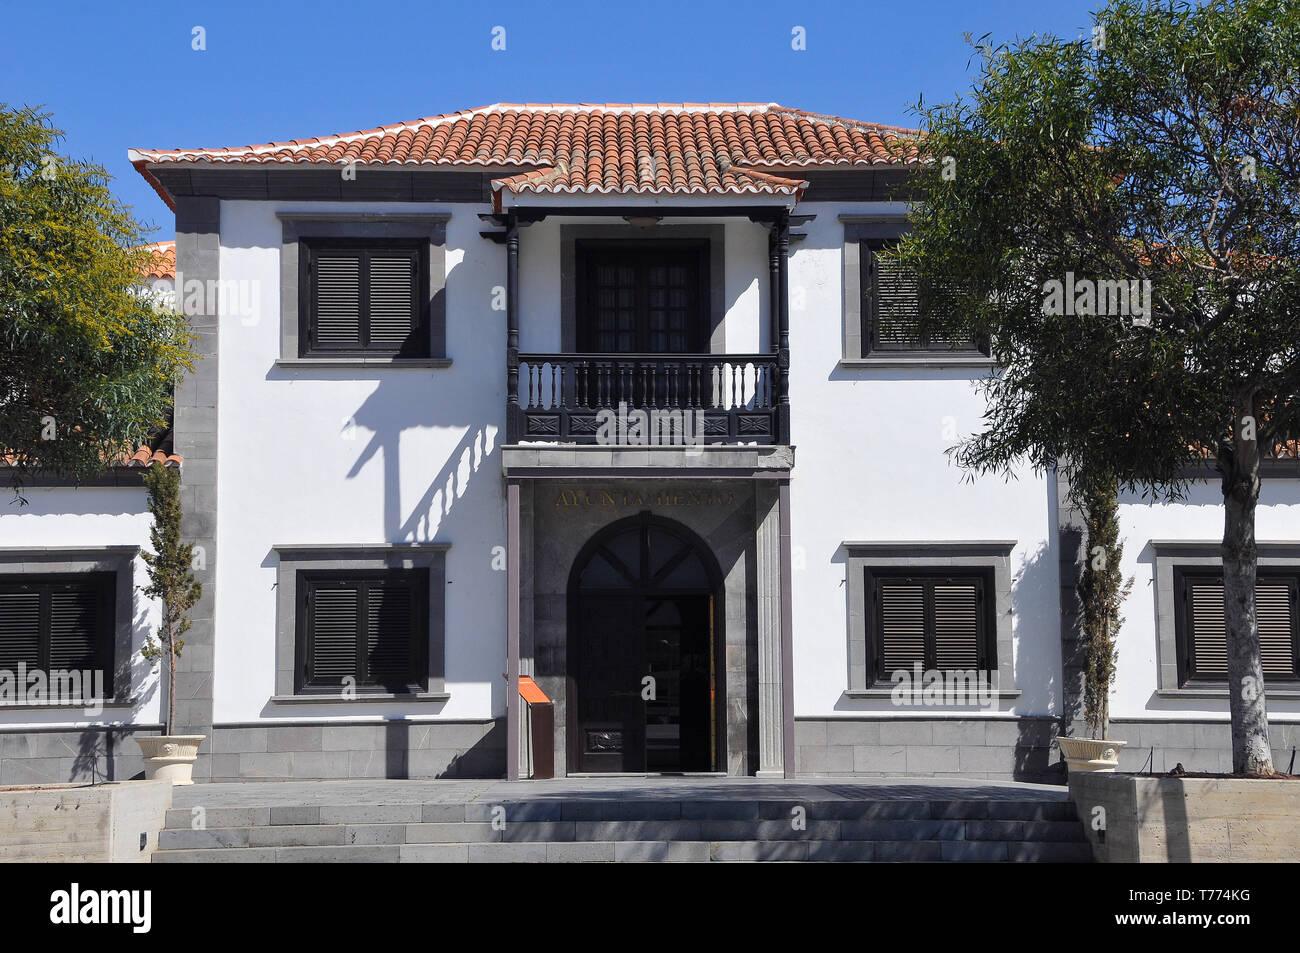 House in Santiago del Teide, Tenerife, Canary Islands, Spain - Stock Image